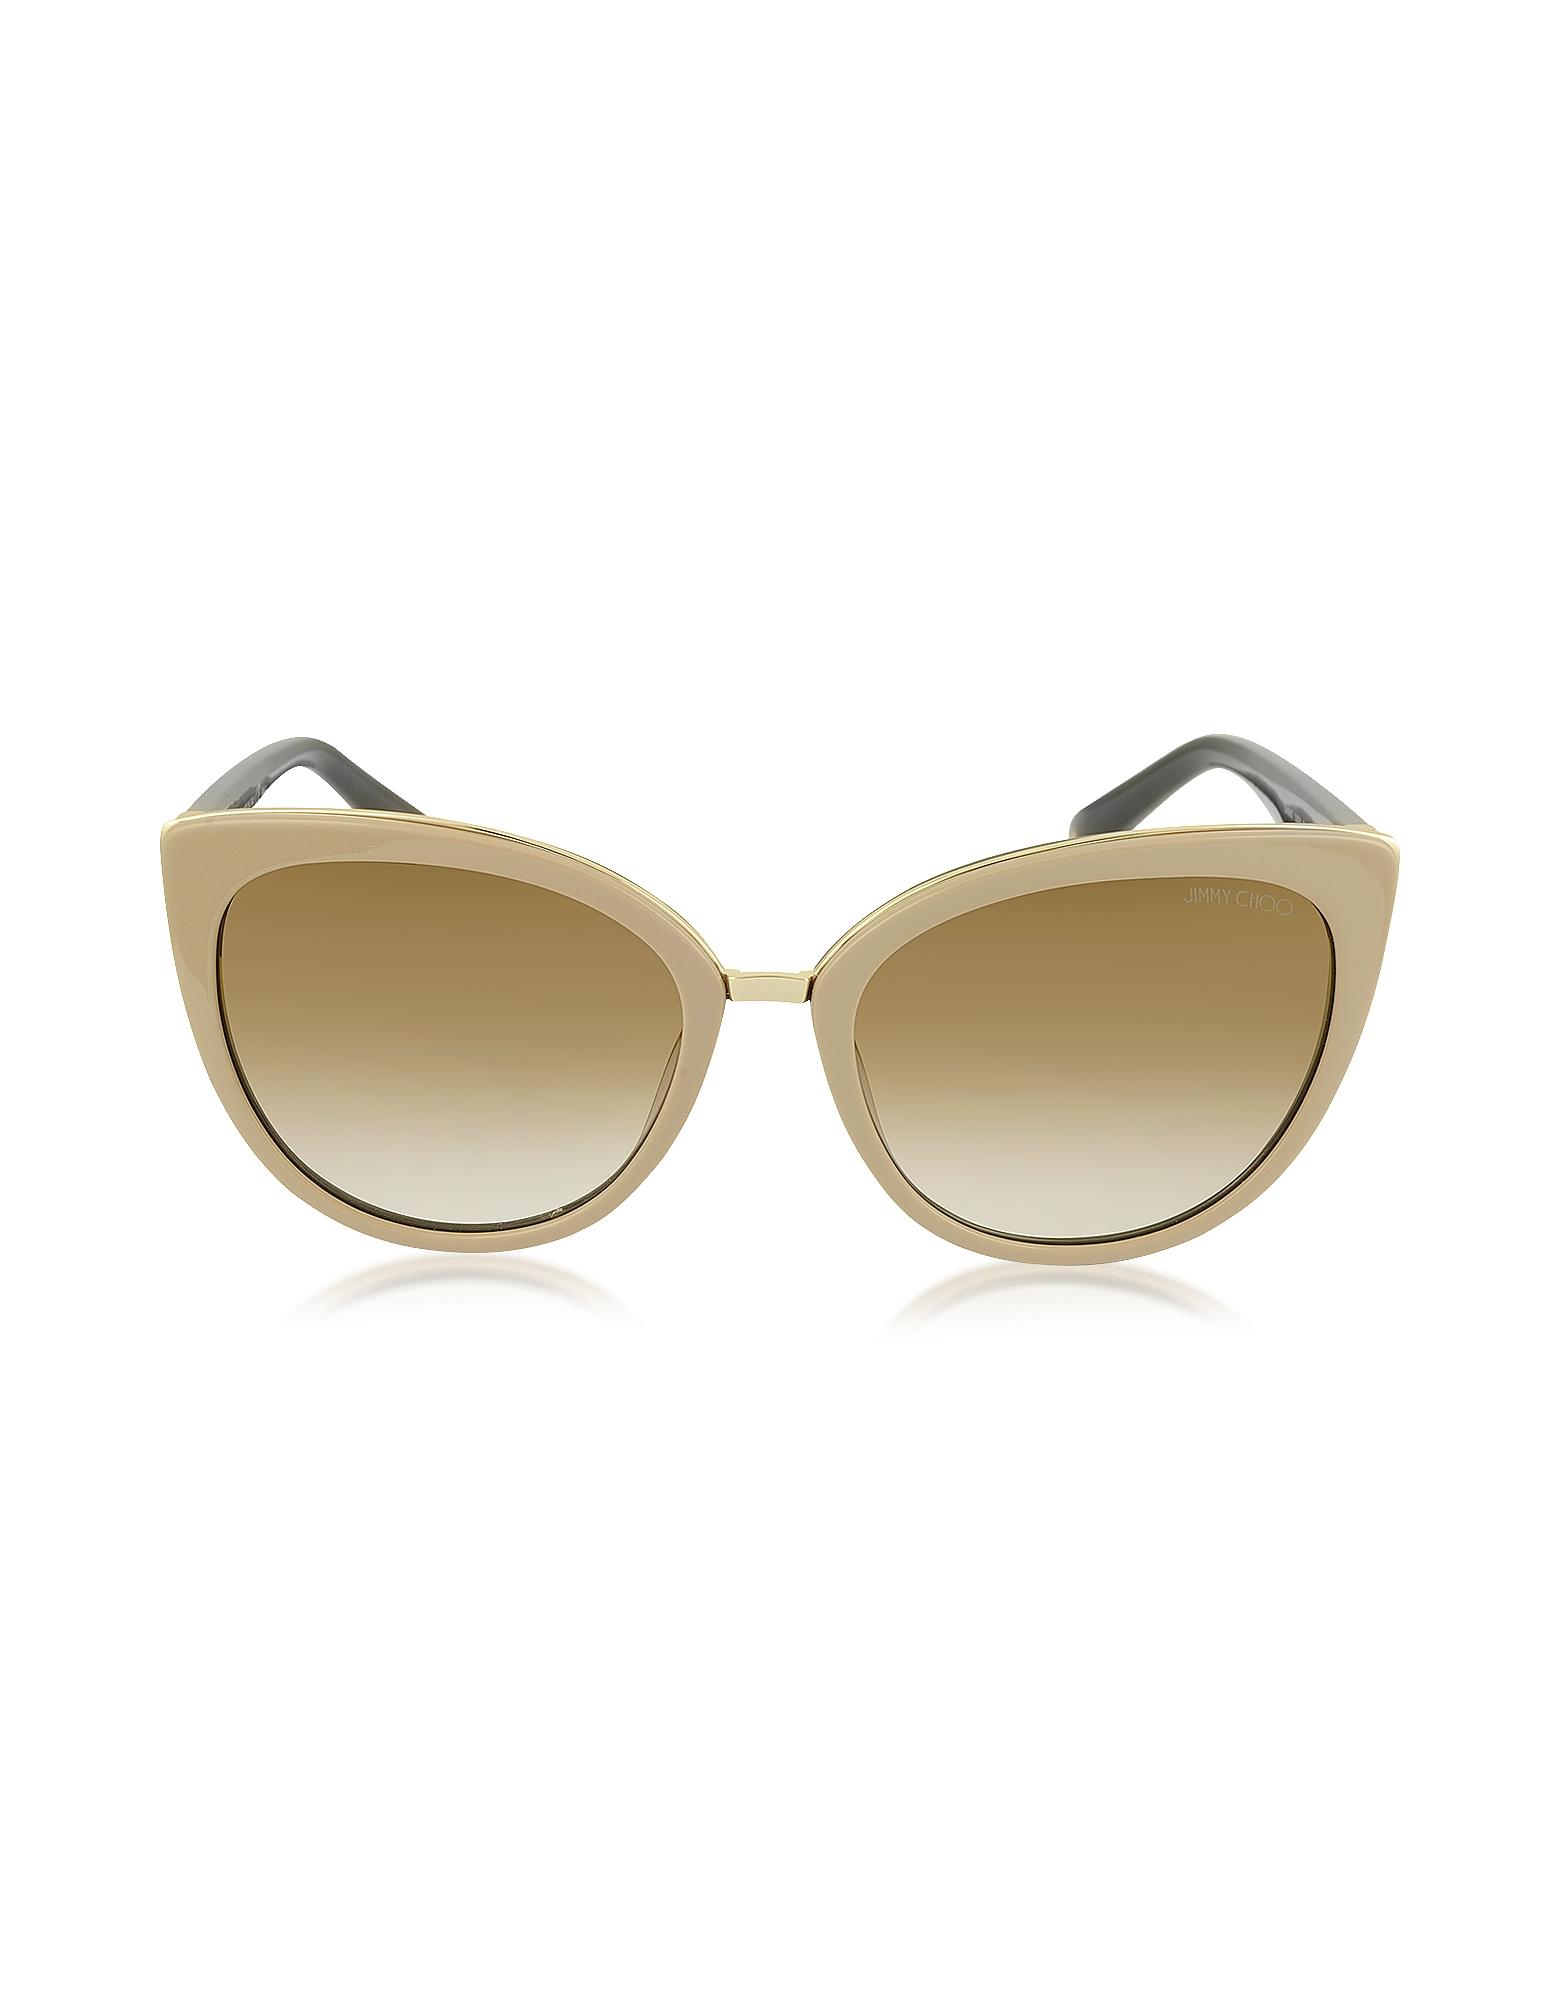 DANA/S Acetate Cat Eye Sunglasses